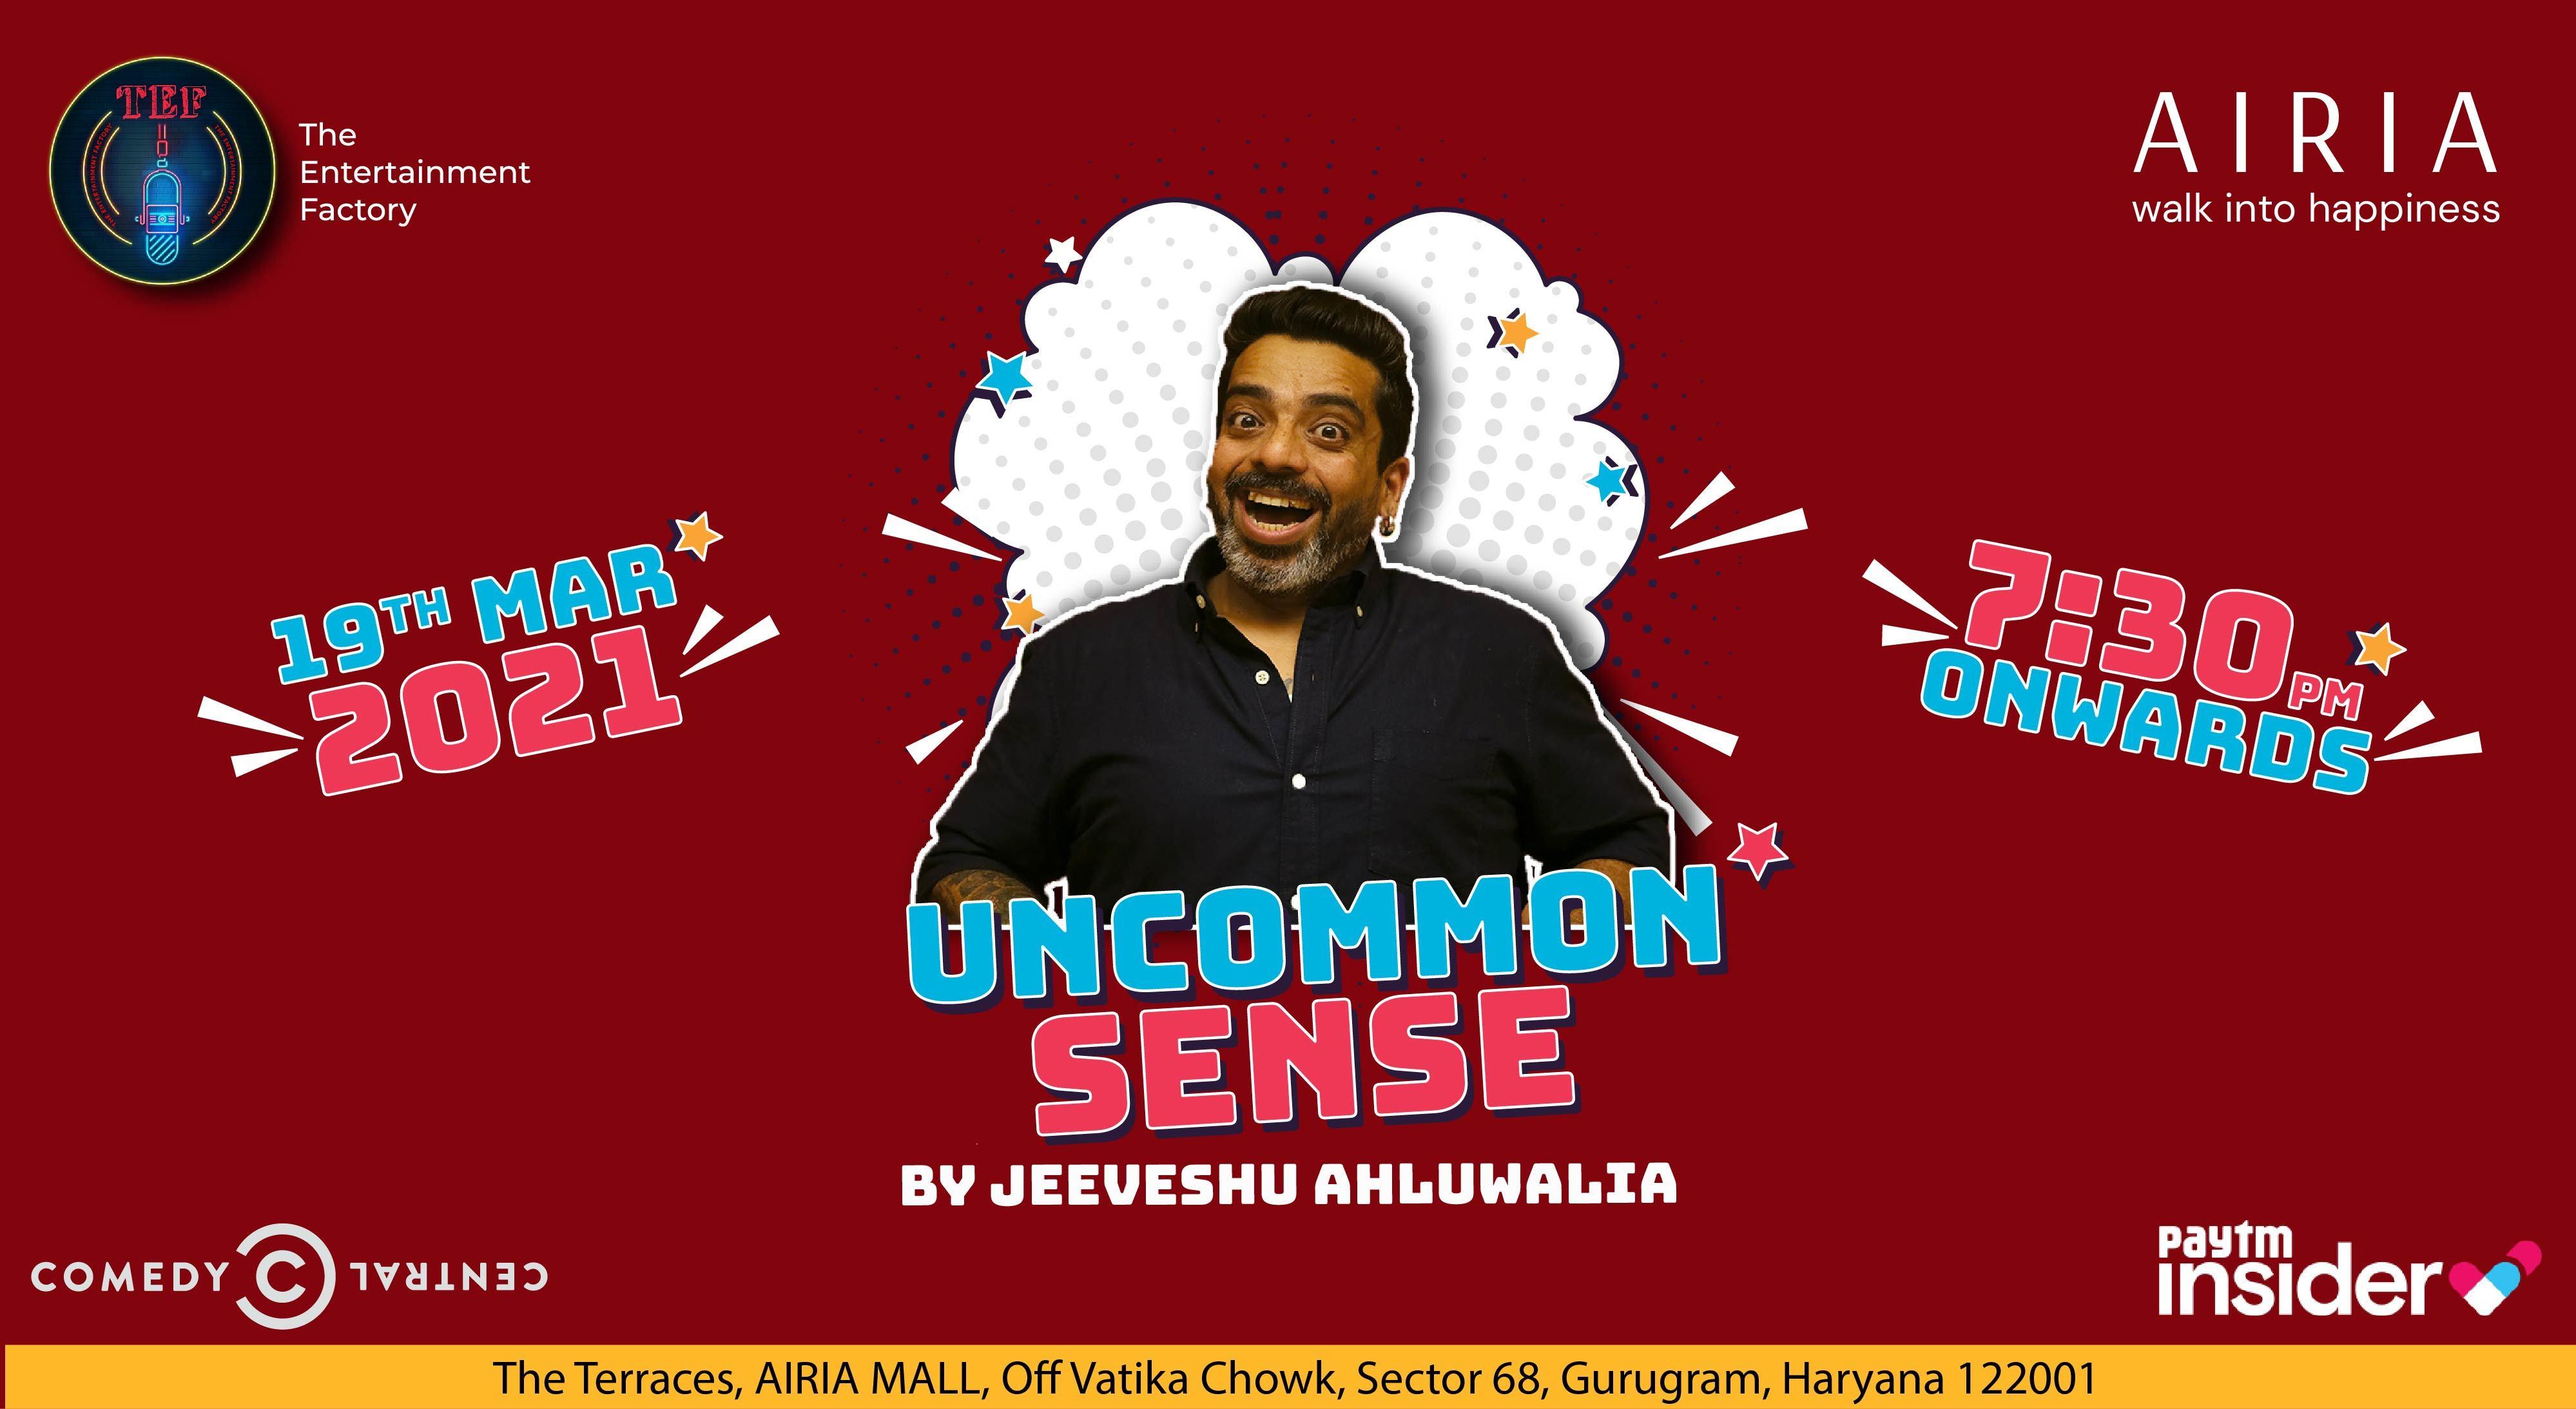 Uncommon Sense by Jeeveshu Ahluwalia